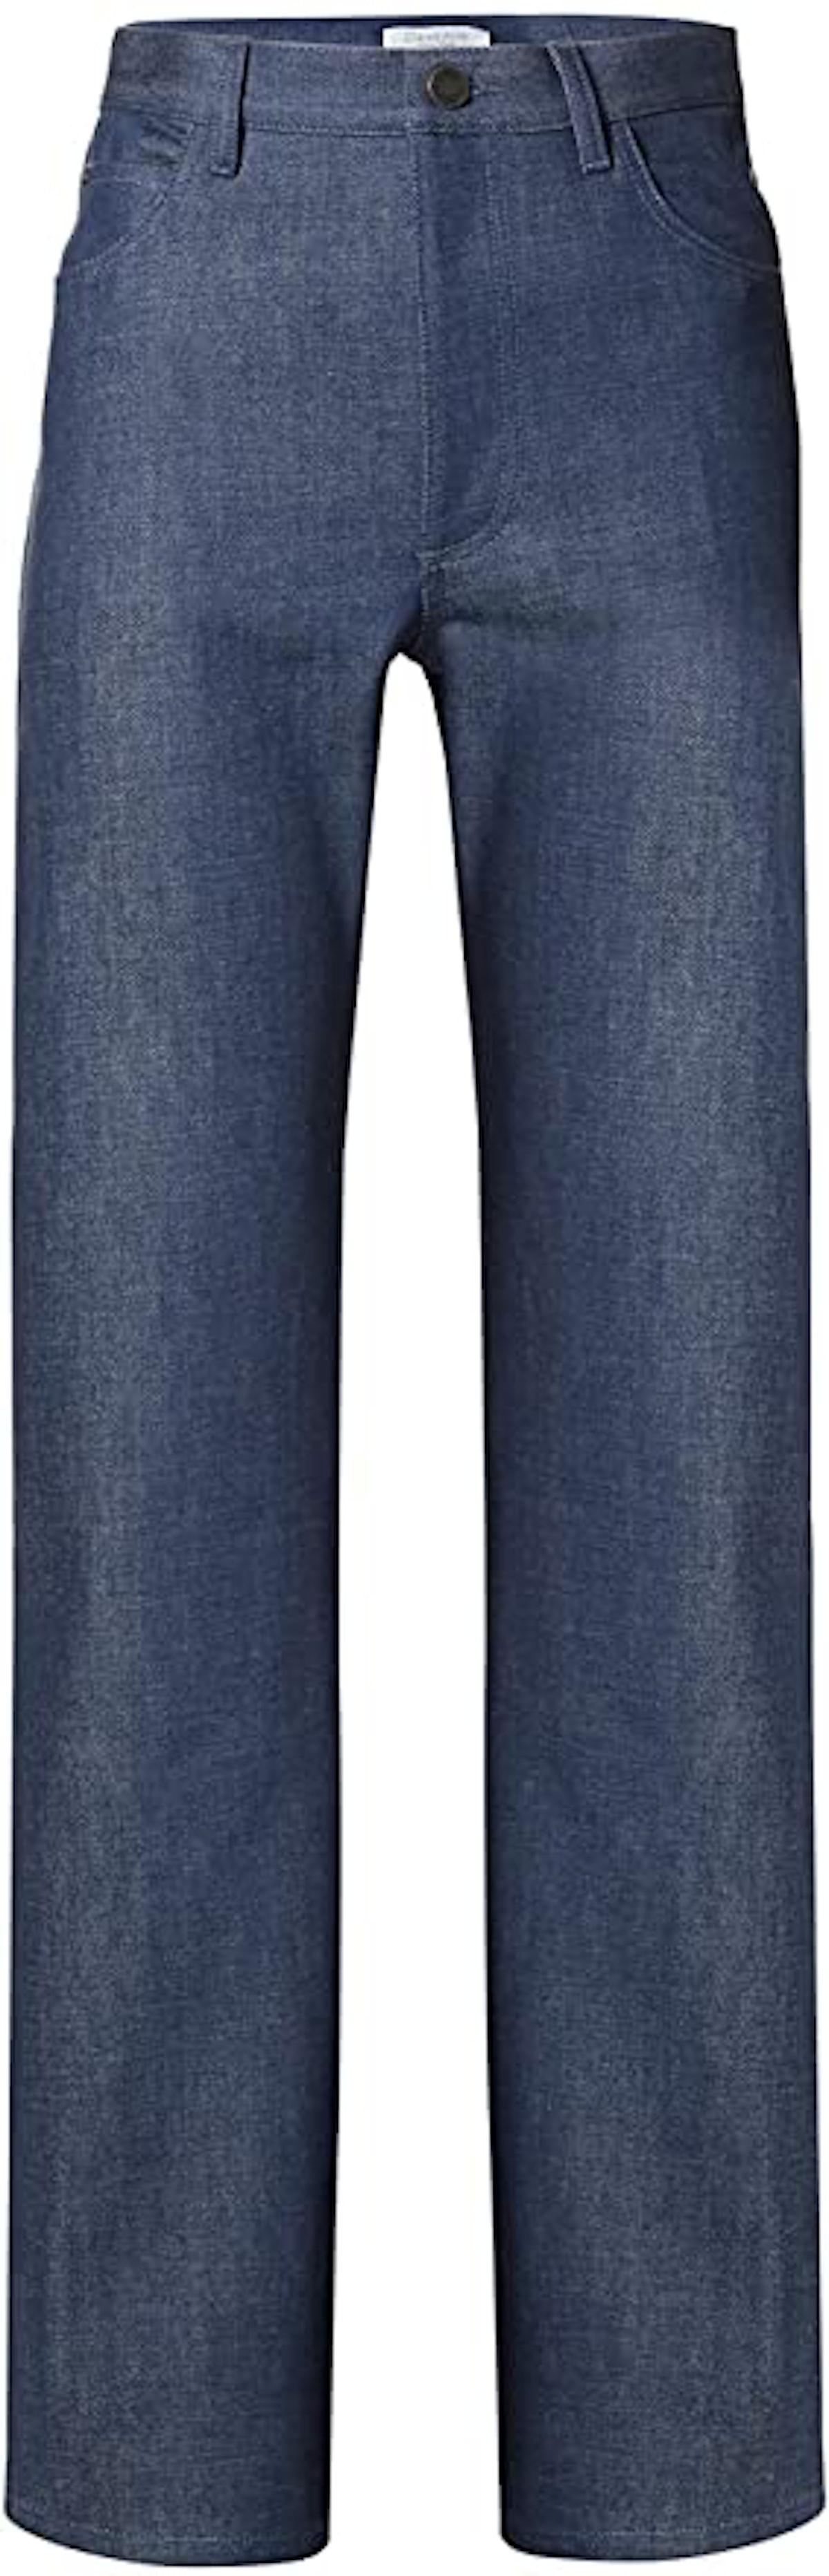 Madison Jeans in Indigo